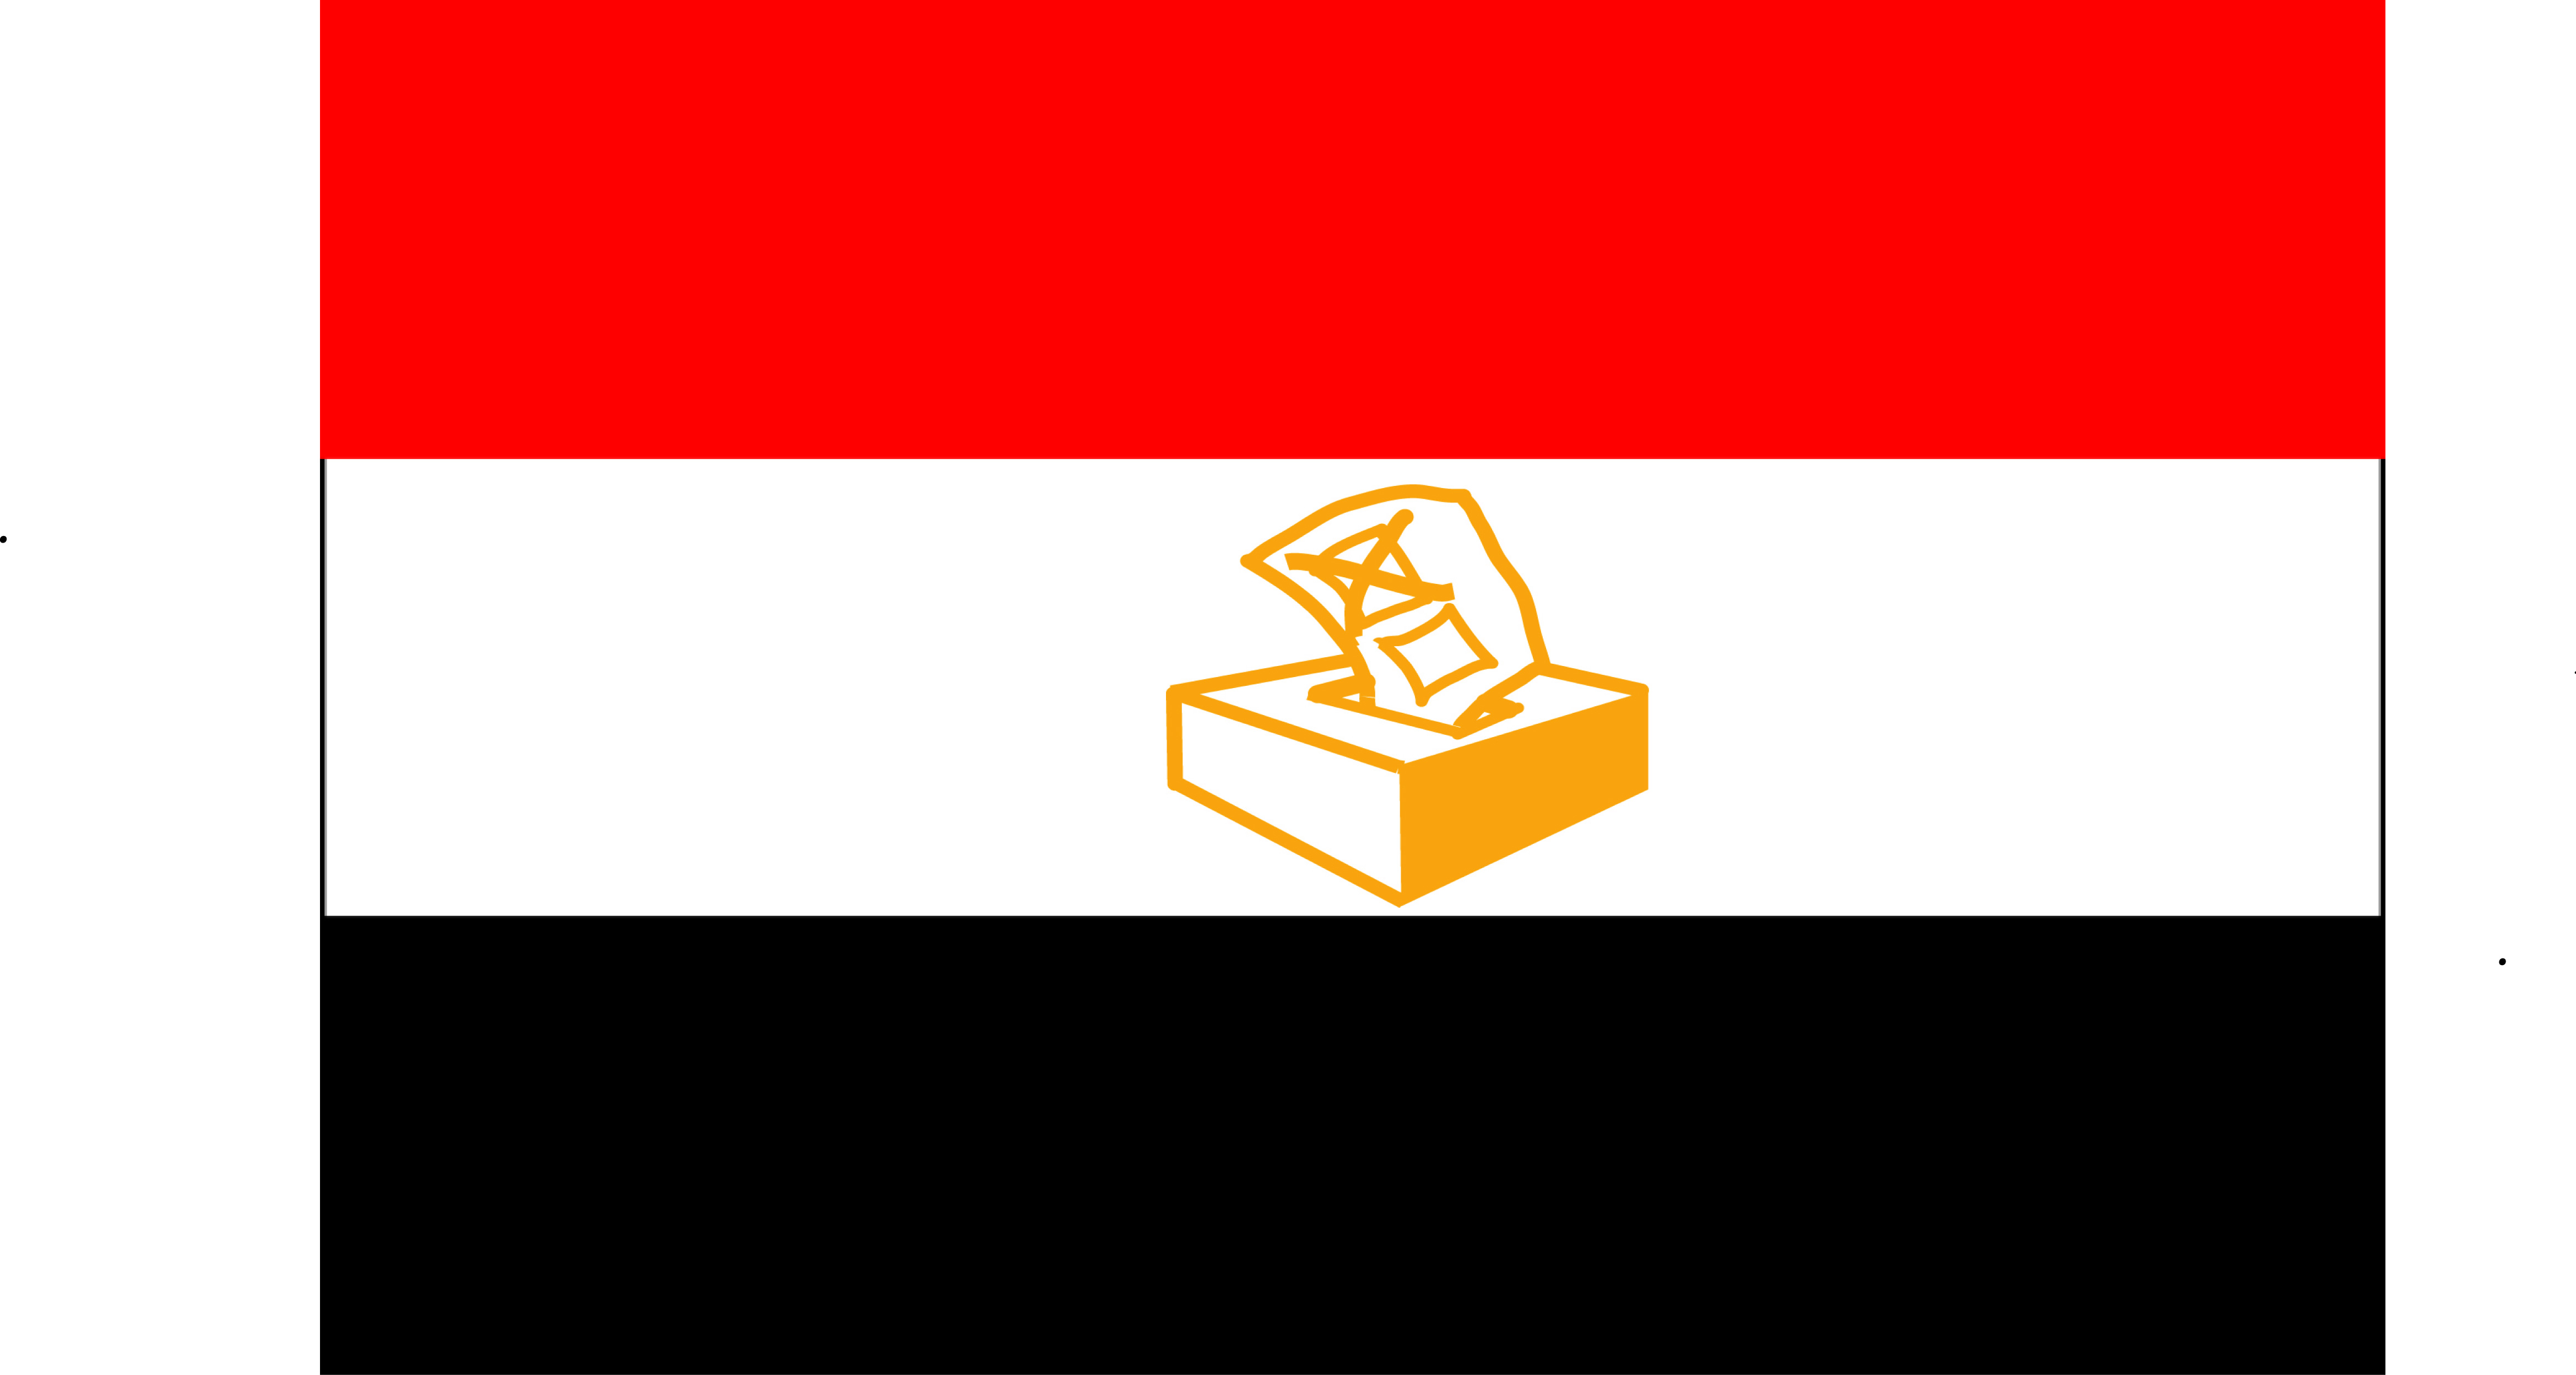 صور علم مصر Egypt Flag (2)